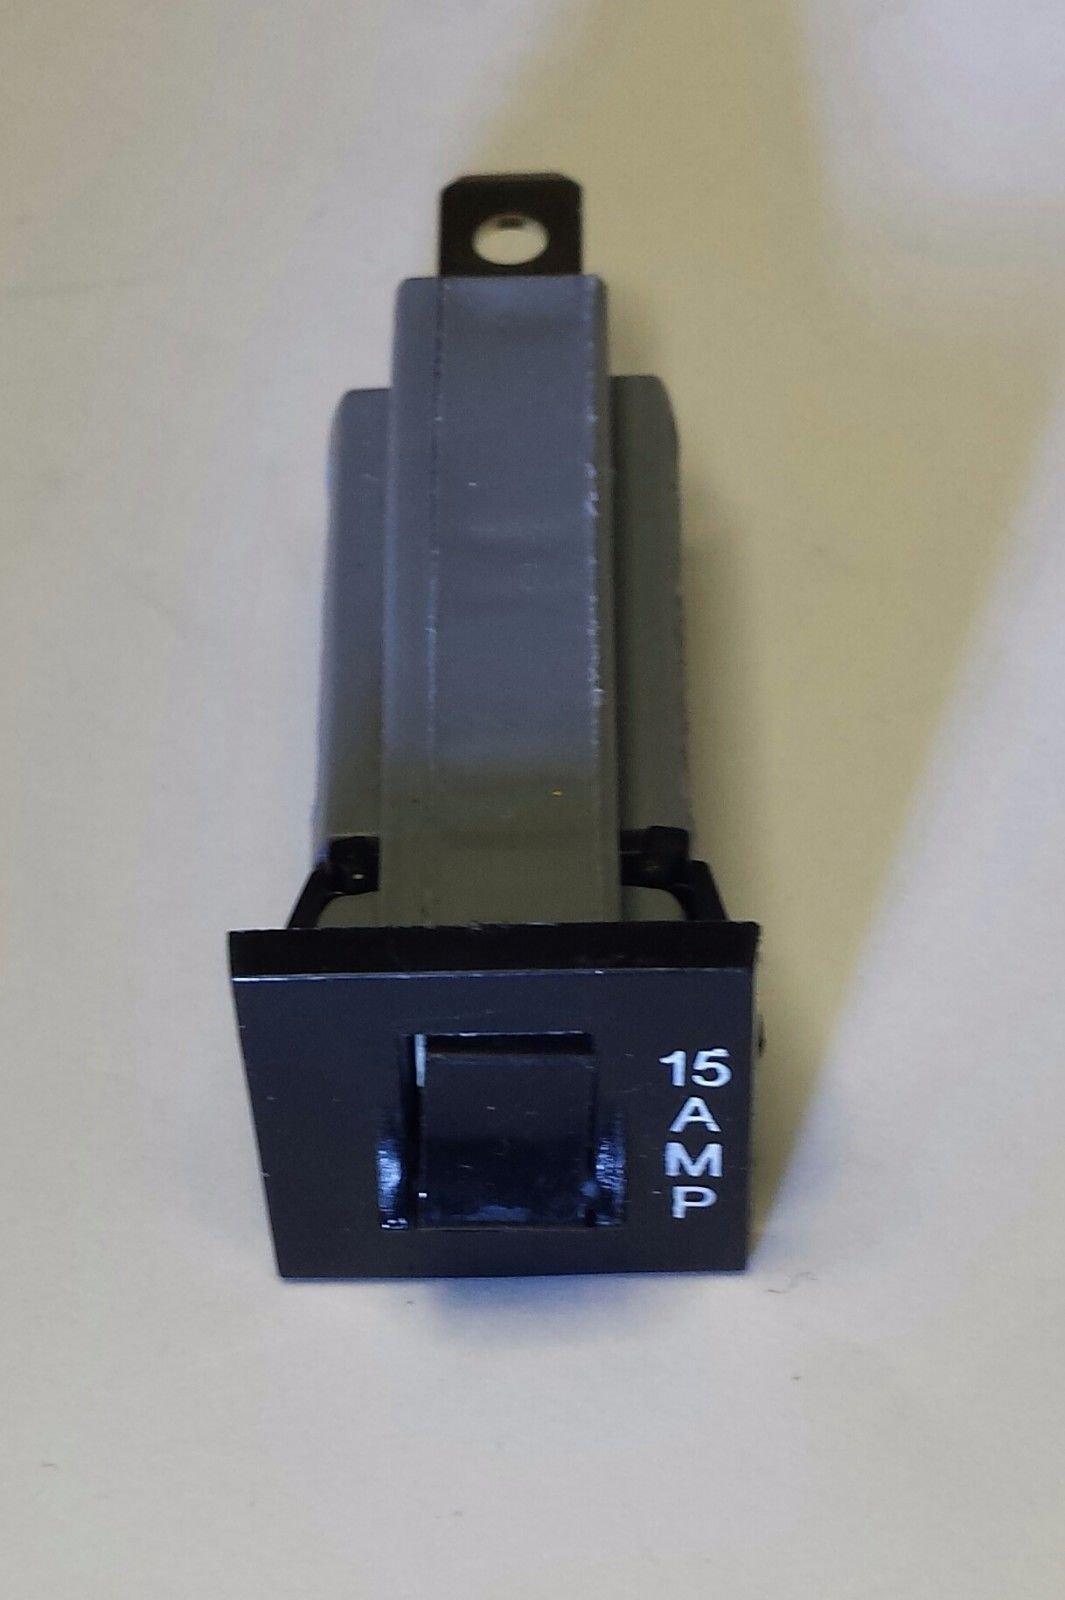 CBK Supply - ZE800-15A Zing Ear thermal circuit breaker fits NordicTrack & ProForm treadmills